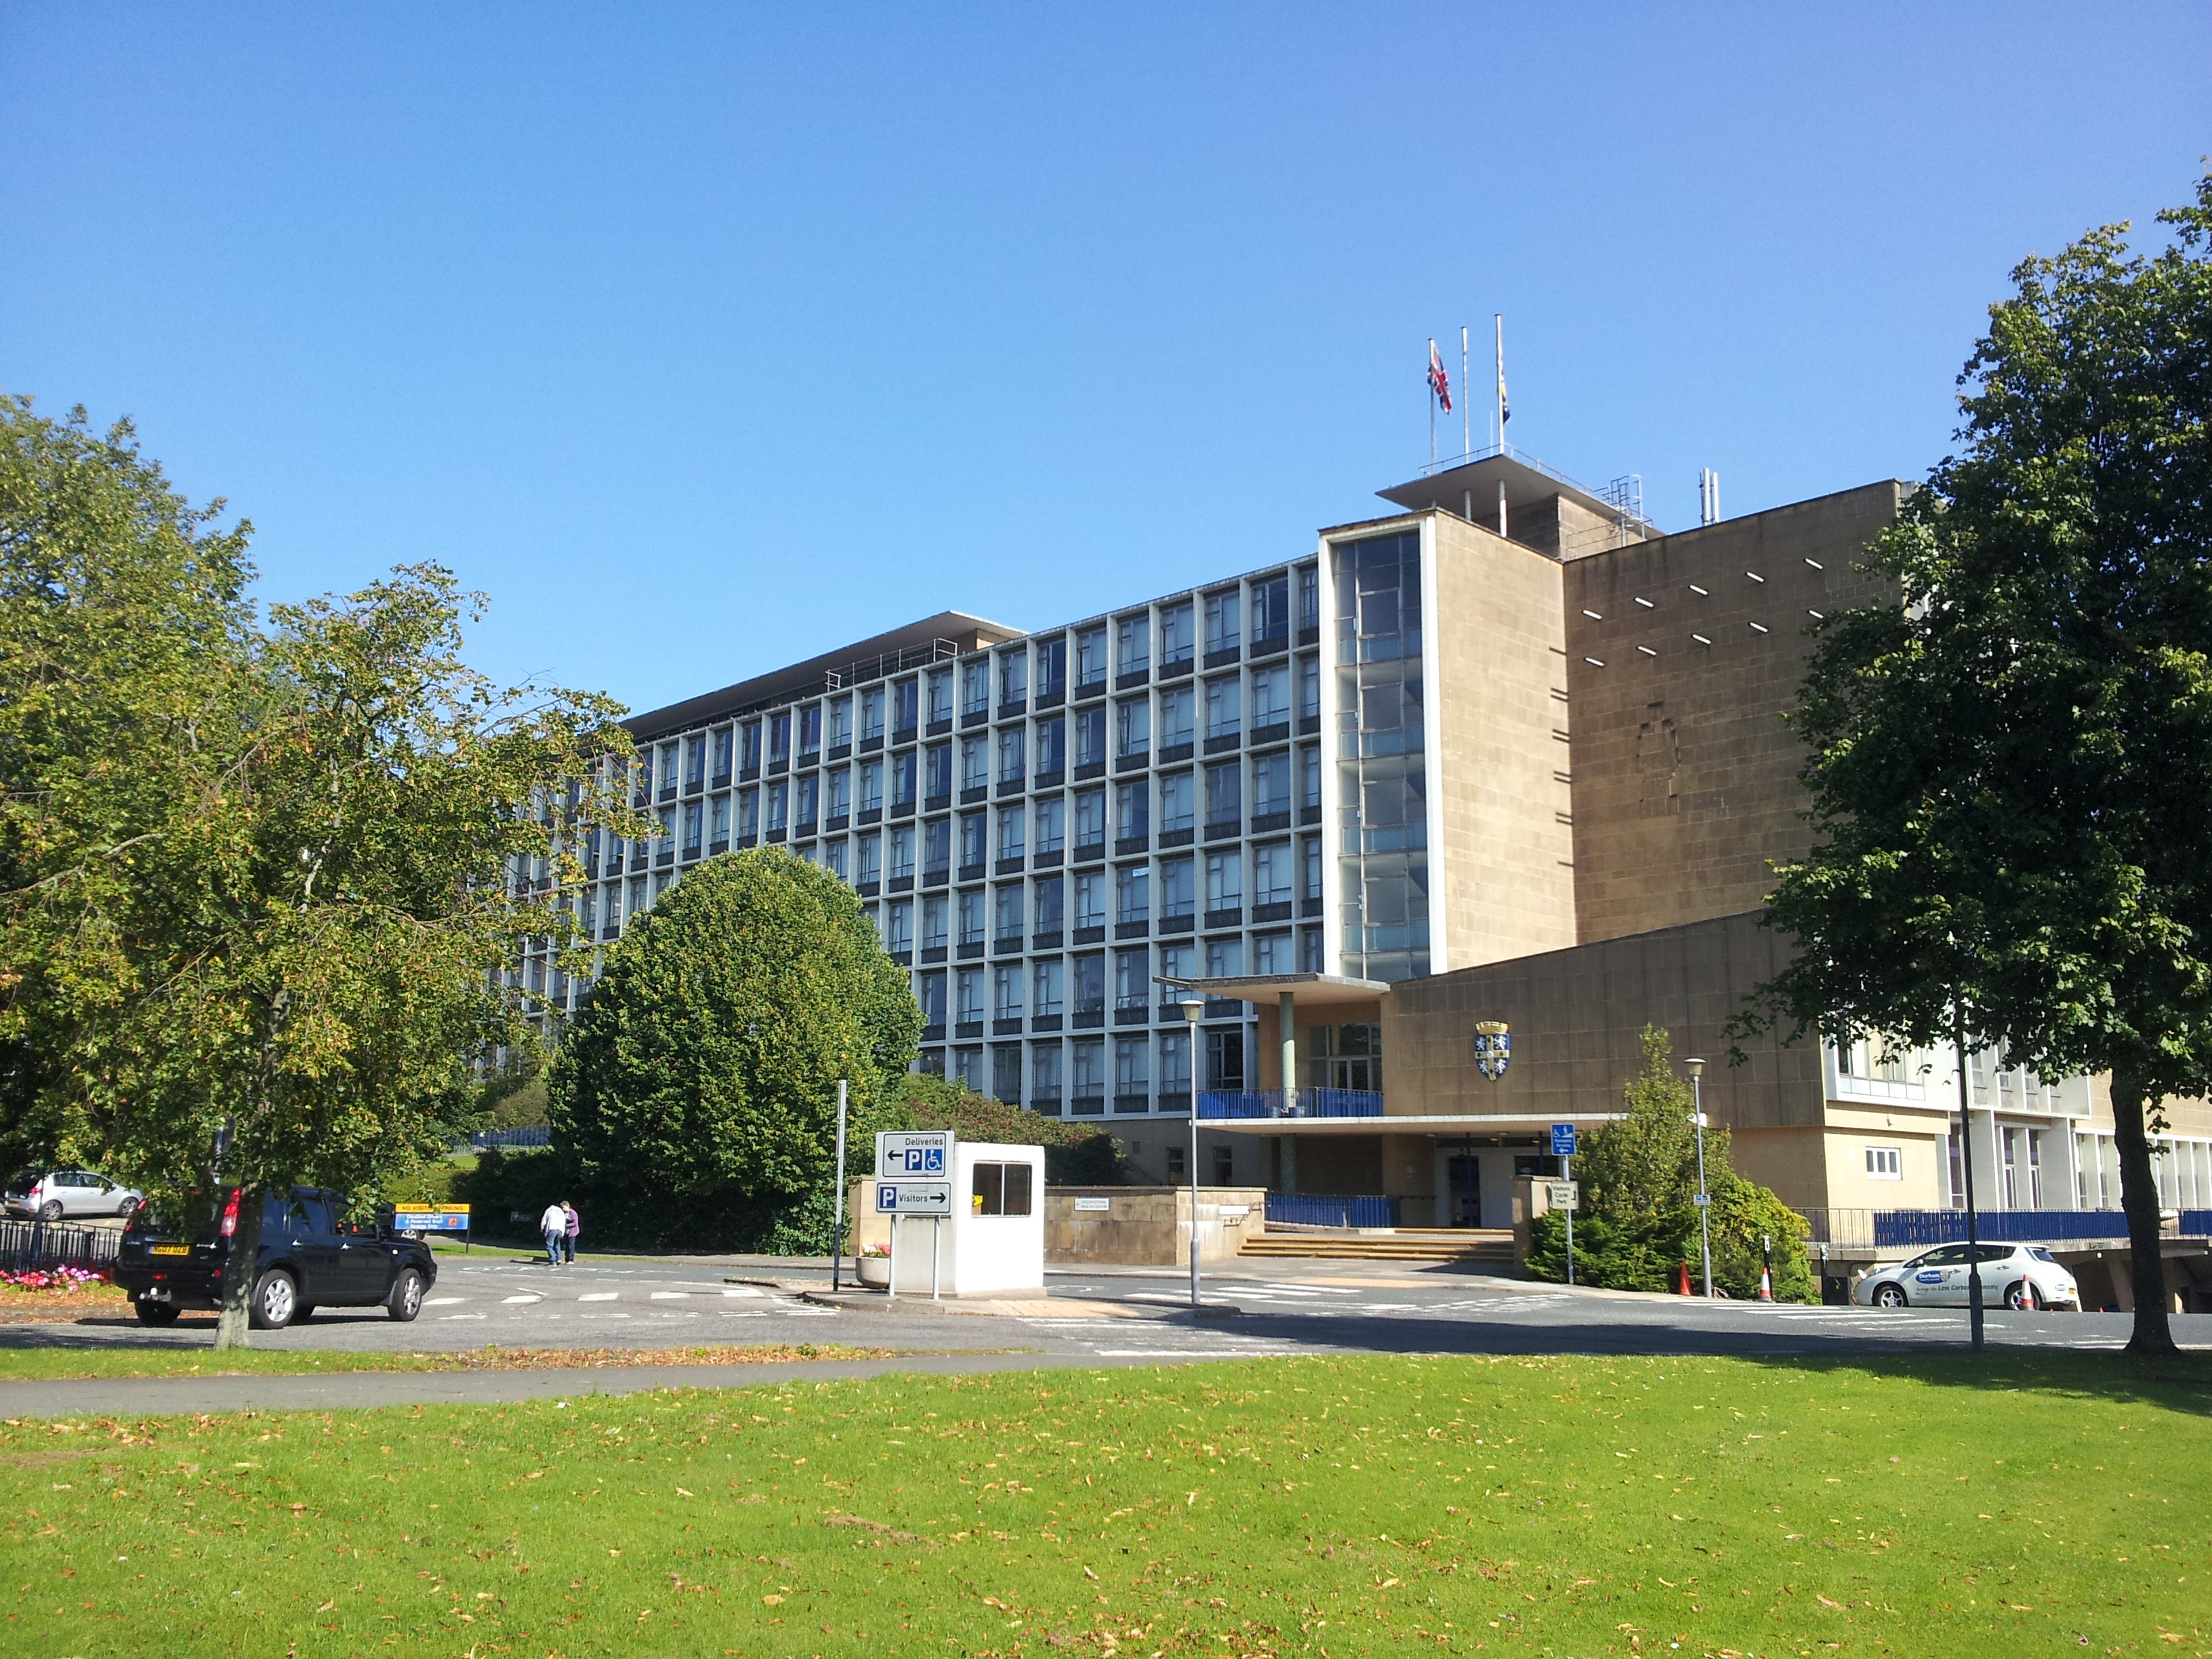 Local Council Tax Support Scheme Plans Consett Magazine